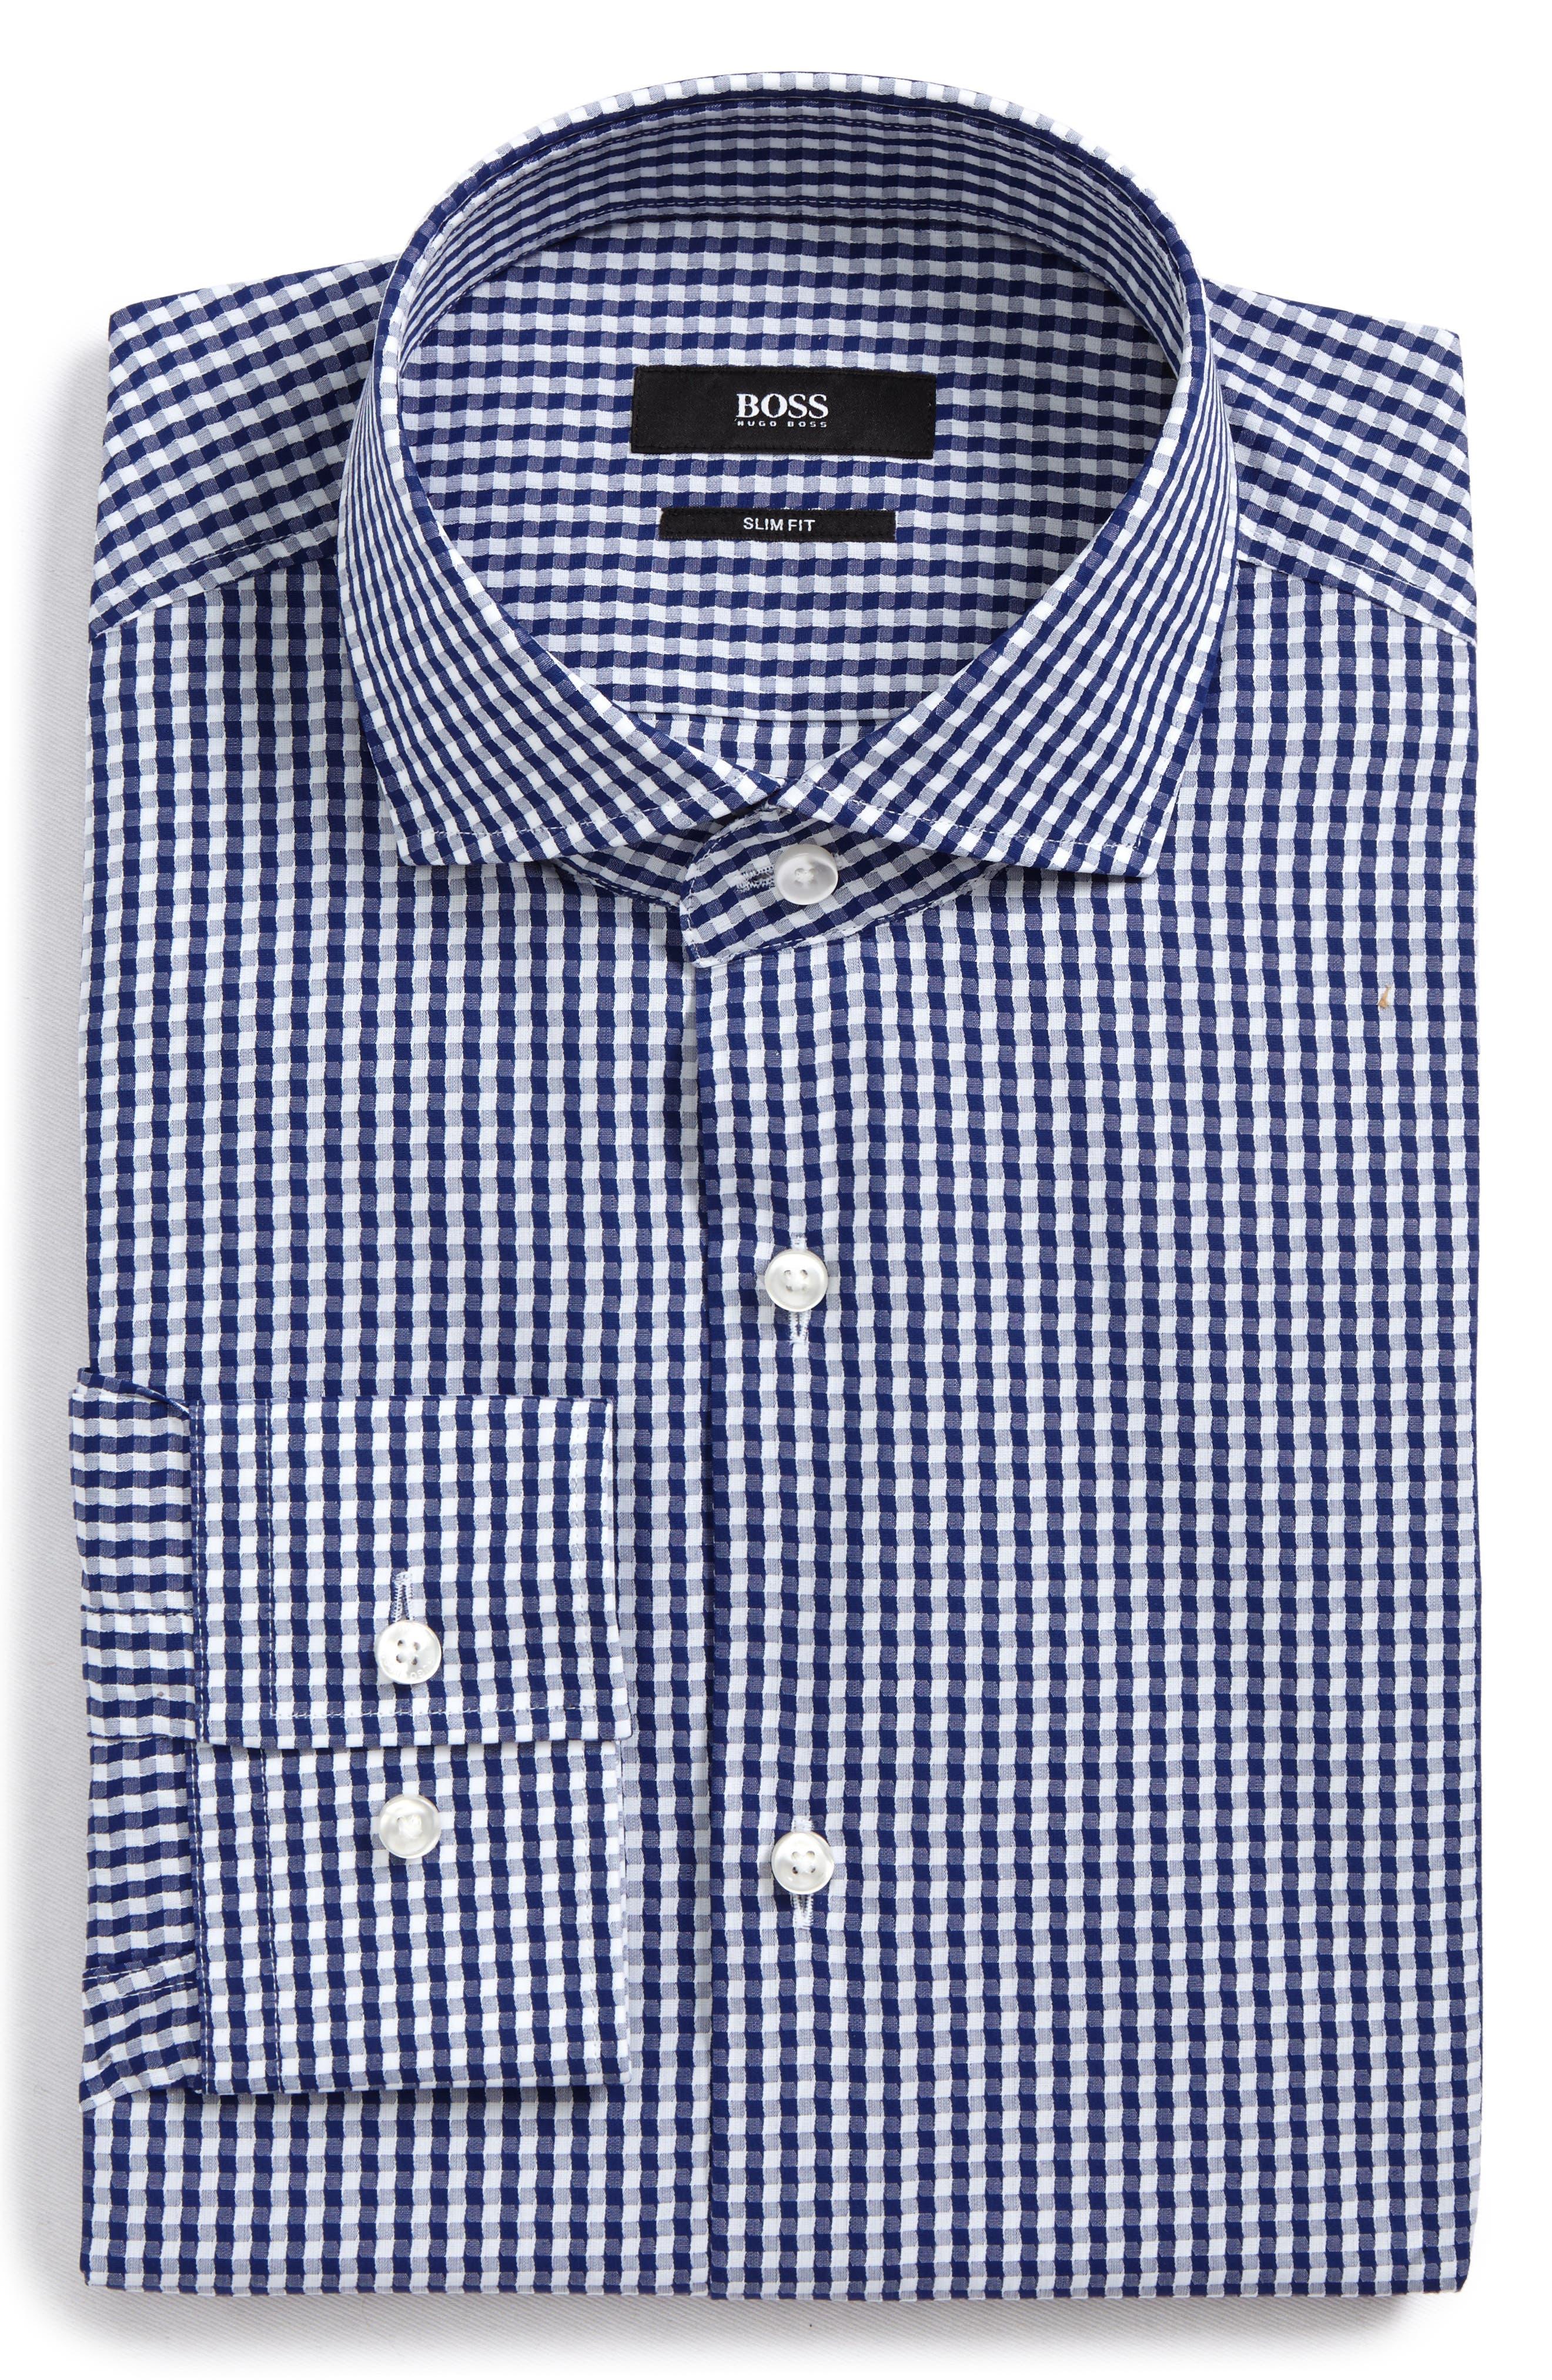 Main Image - BOSS Jason Slim Fit Check Dress Shirt